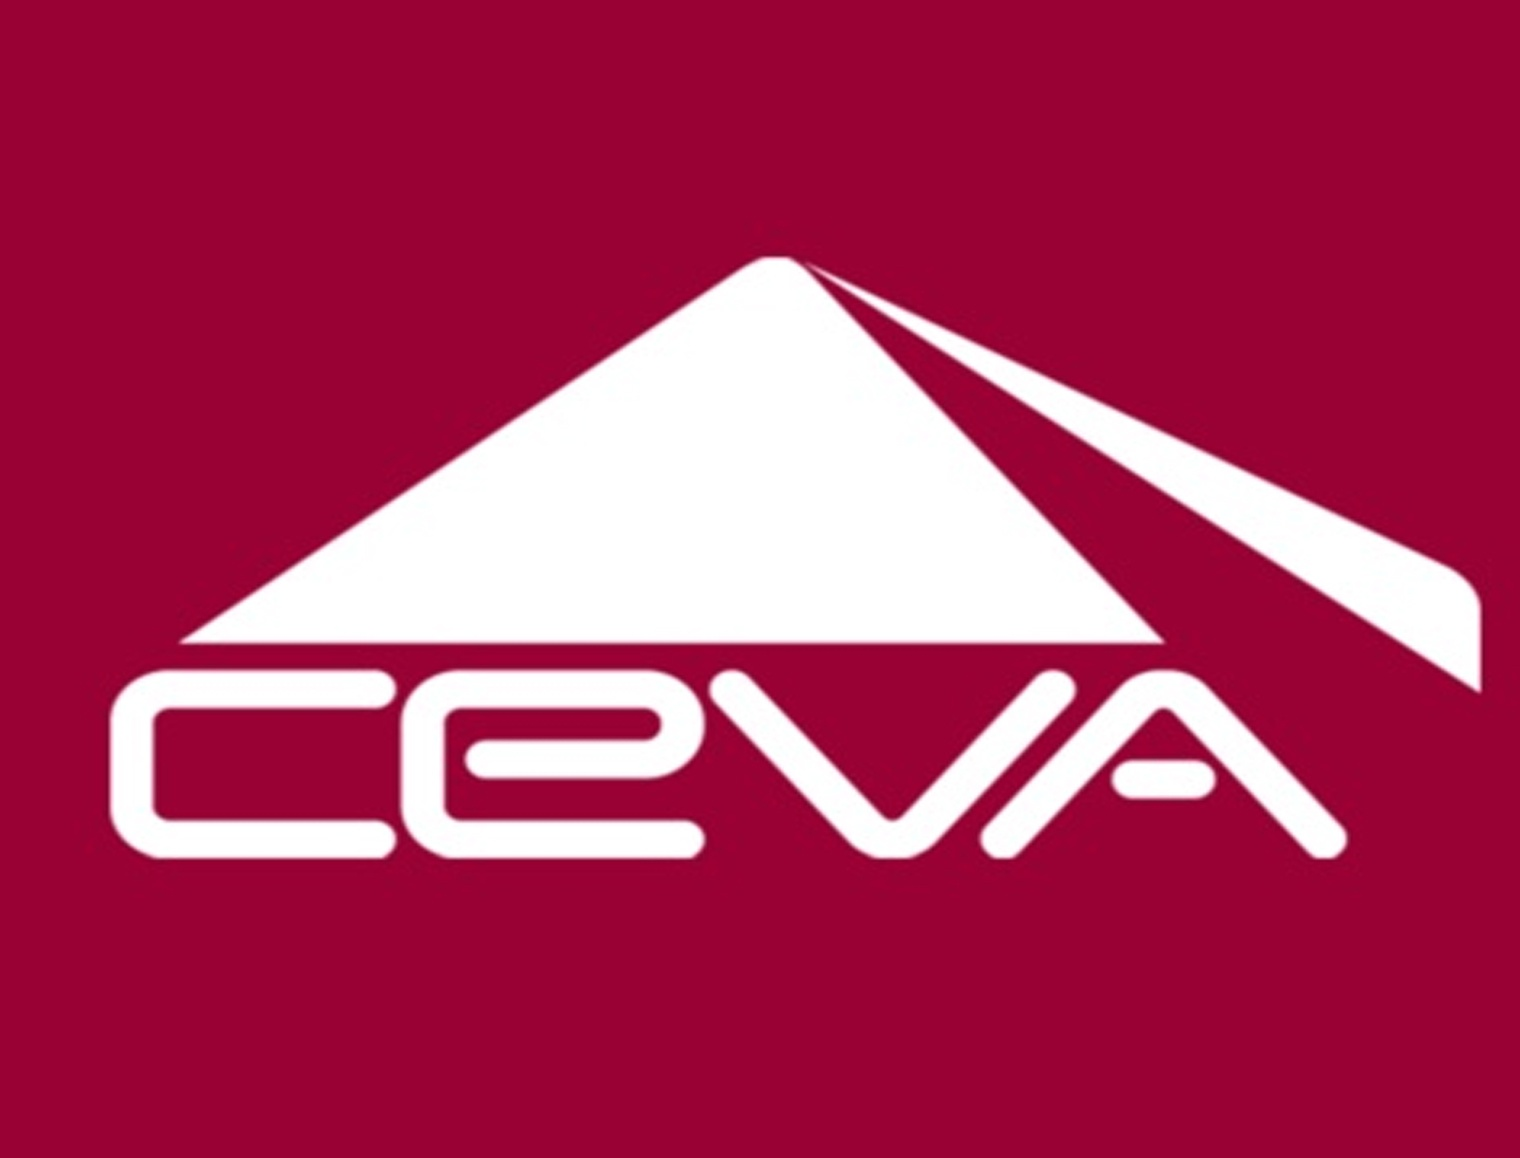 Ceva Tracking | Track Your Shipment Live | Alltrackingcourier